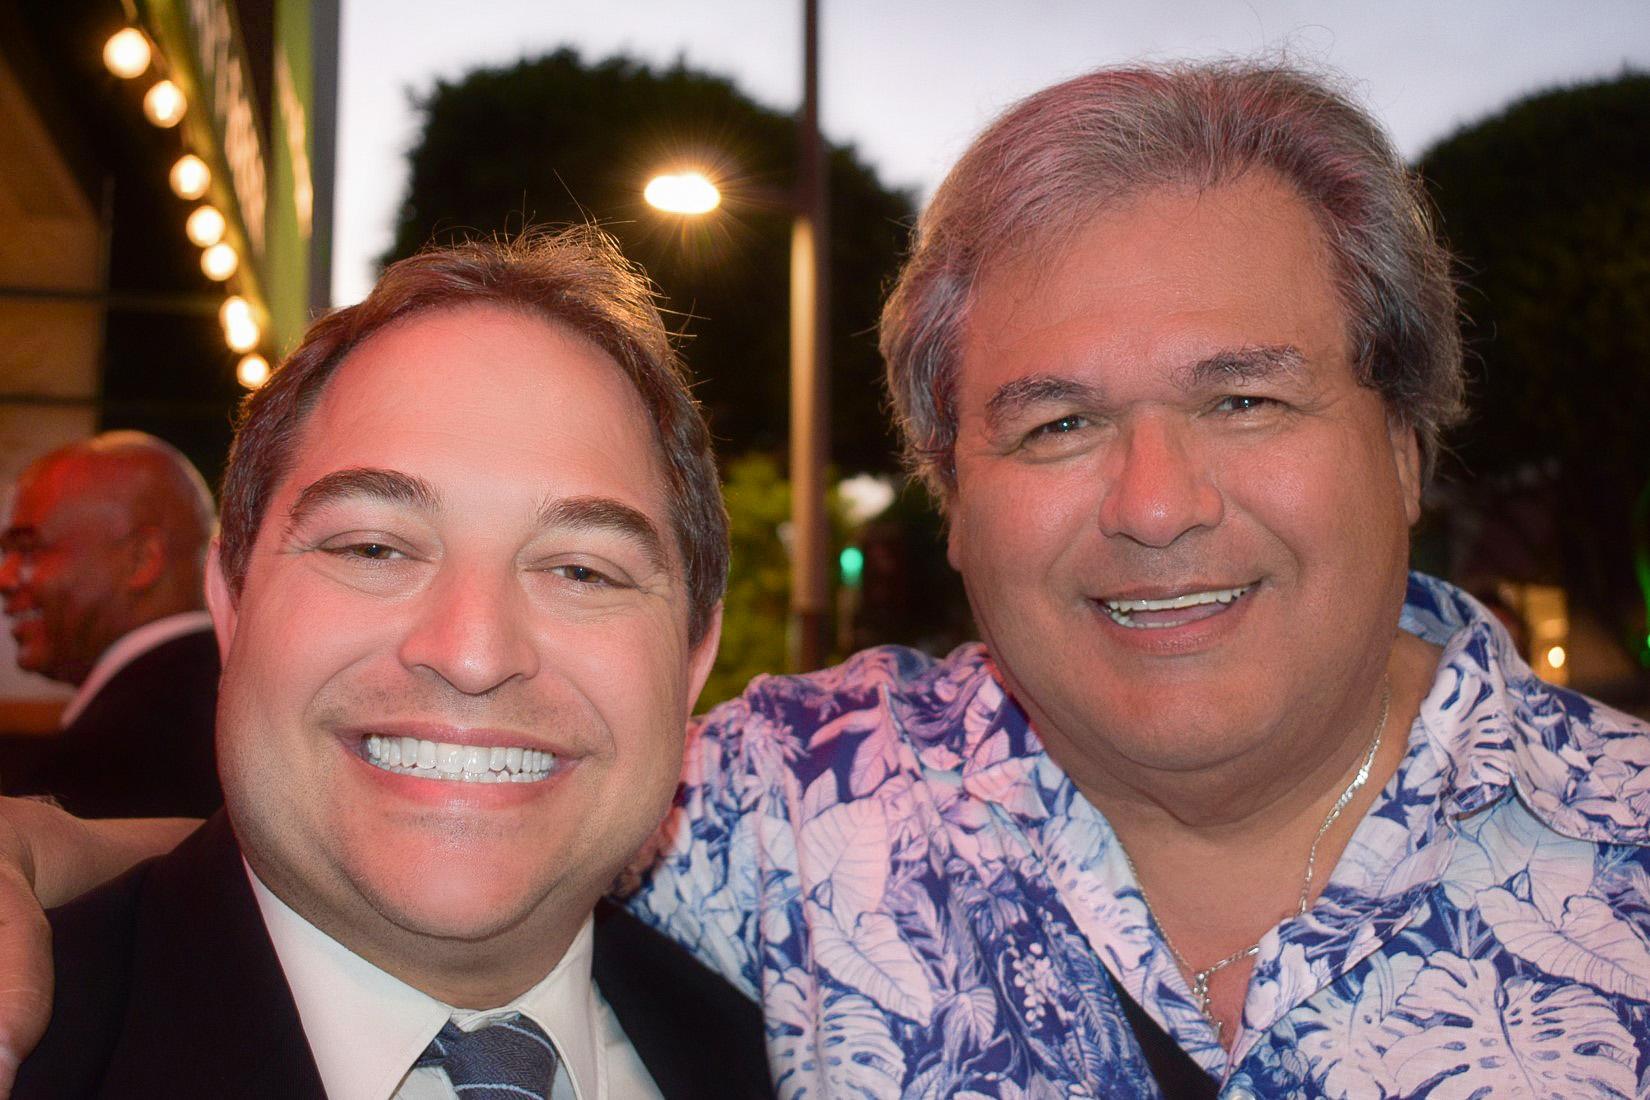 Producer Tony Sands and legendary news journalist Bob Jimenez unite to conserve Hollywood's jobs.